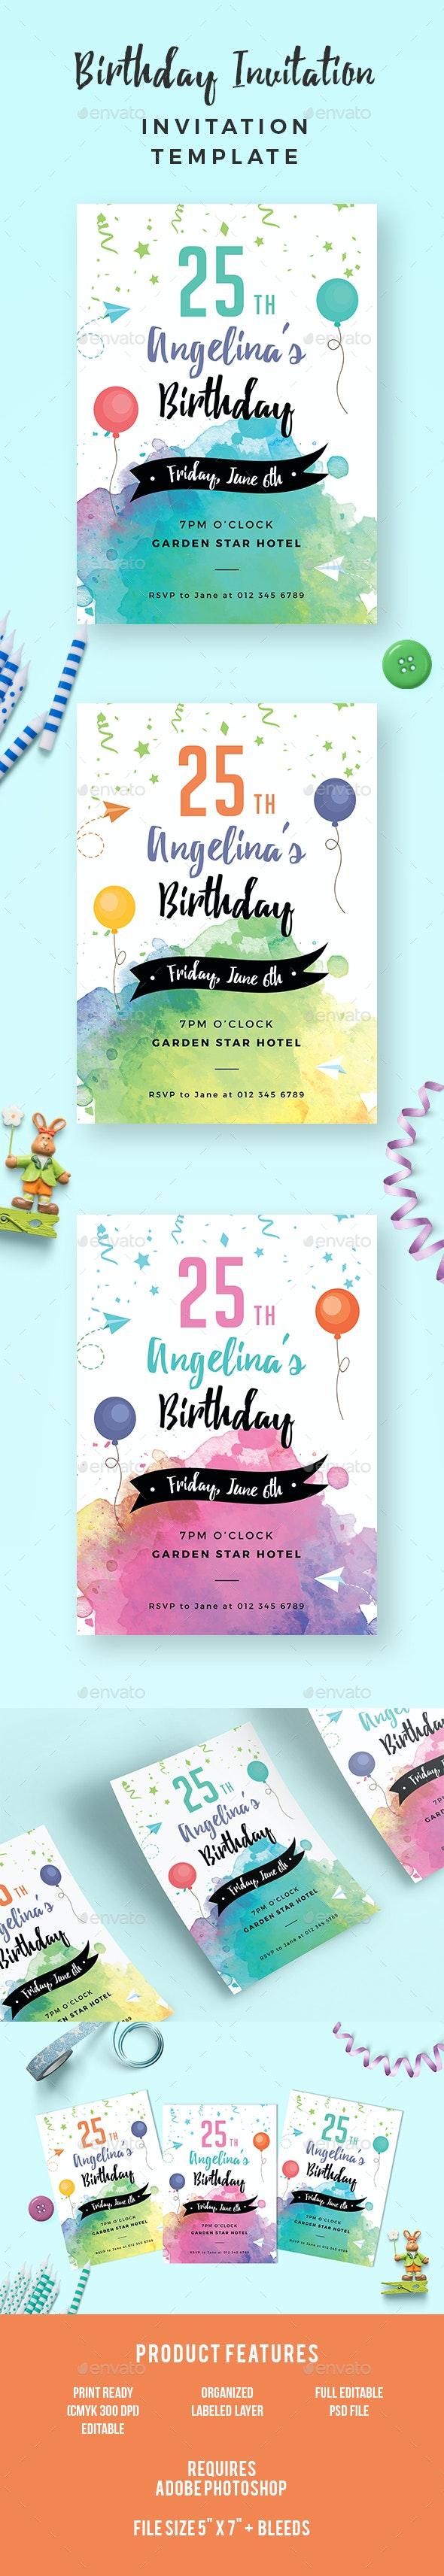 Birthday Invitation - Invitations Cards & Invites